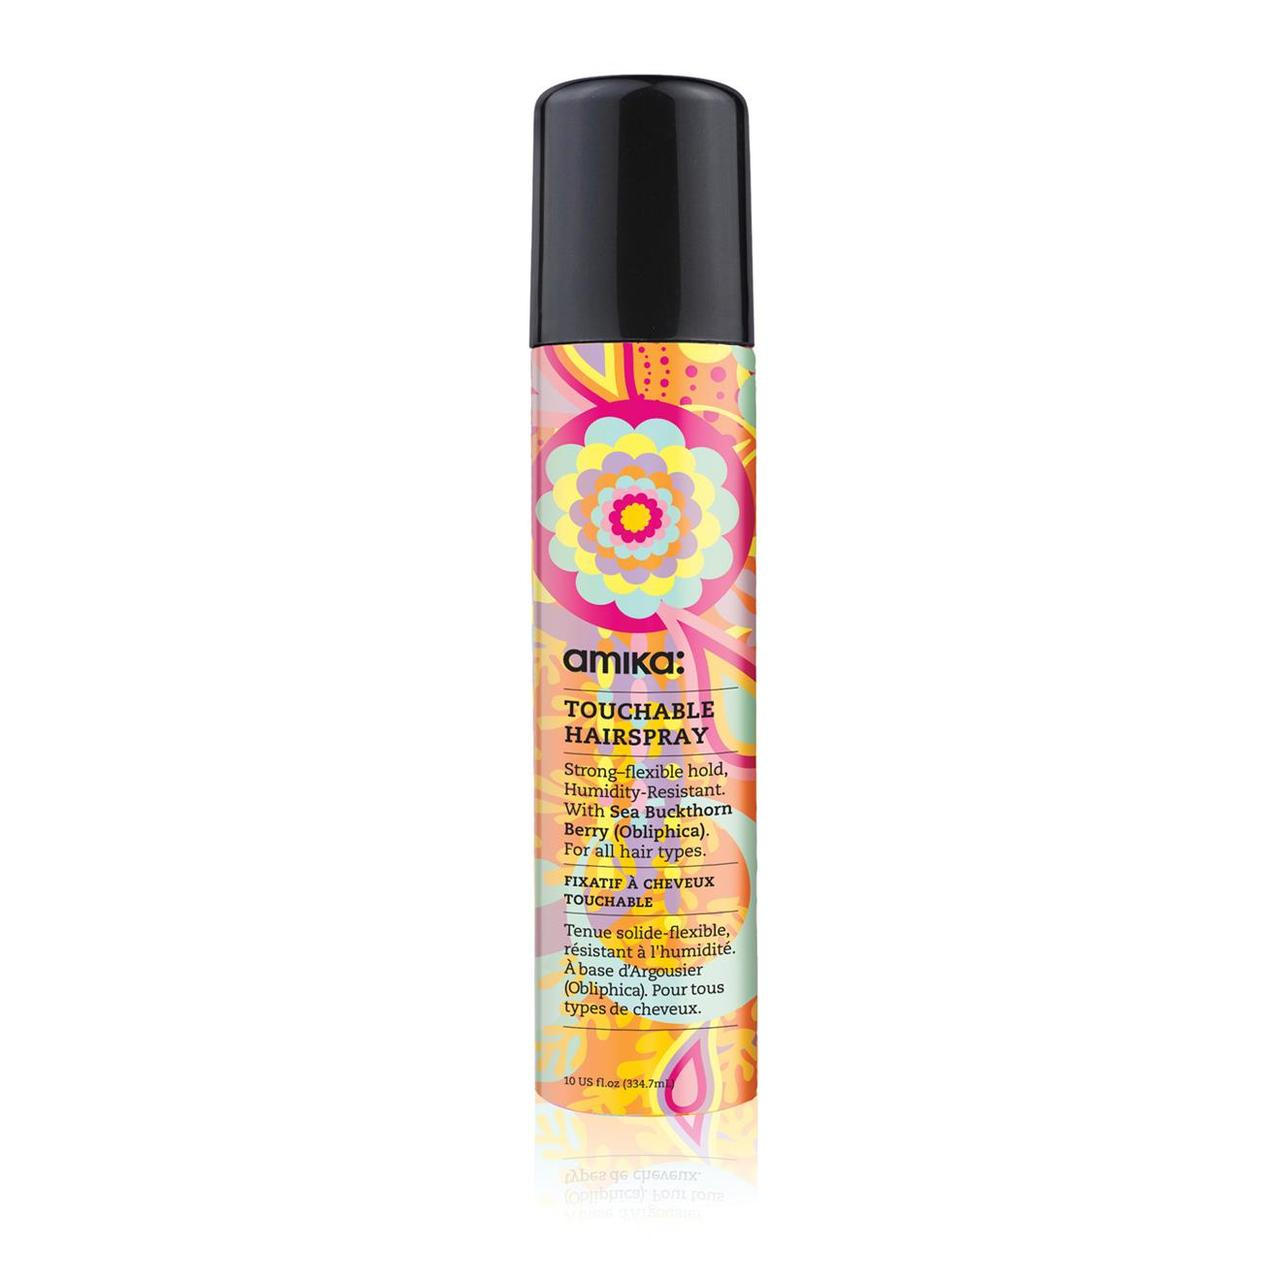 Amika Obliphica Touchable Hairspray 10 oz